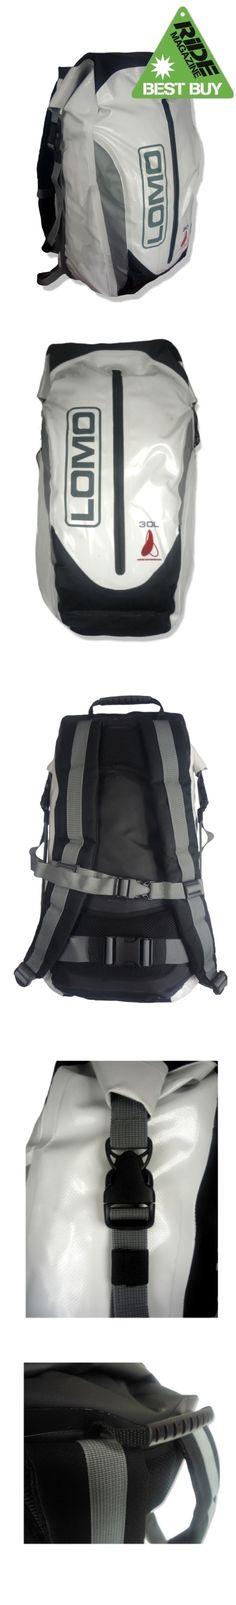 30L Drybag Daysack